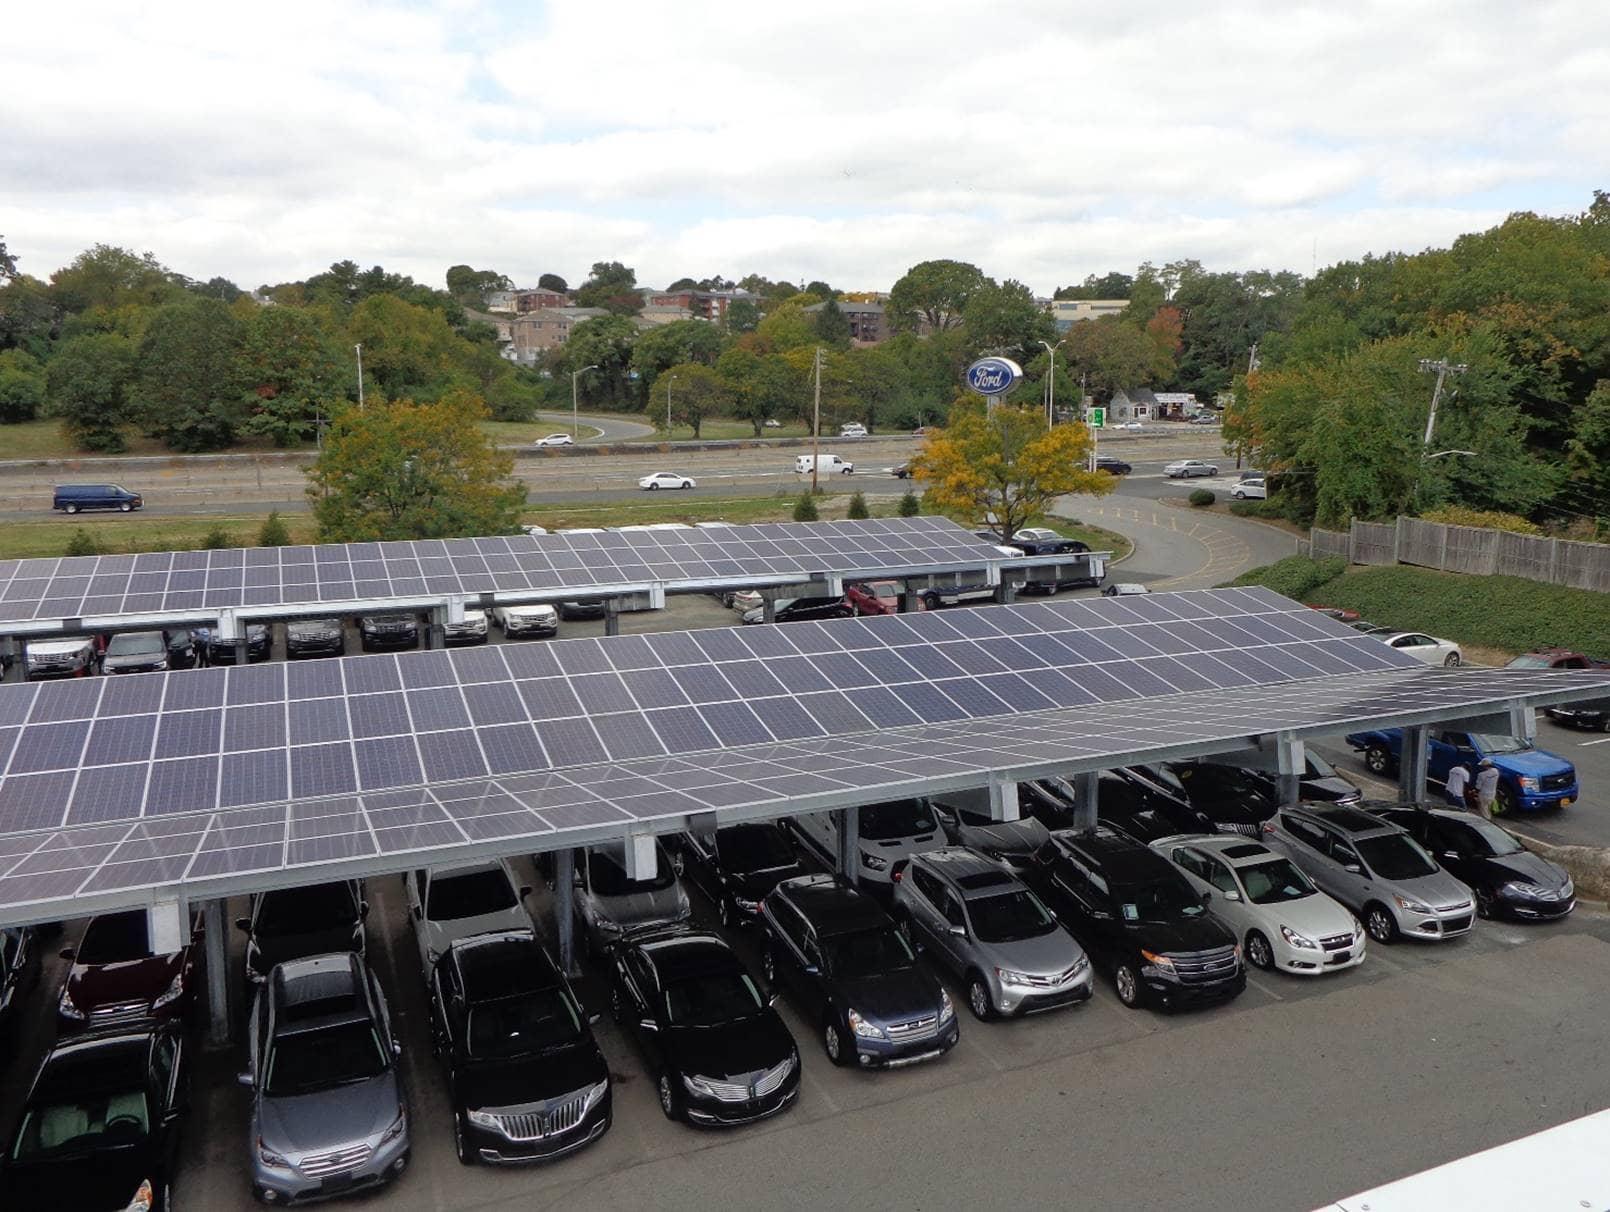 Auto-Dealership New York Auto Dealer Goes Fully Solar